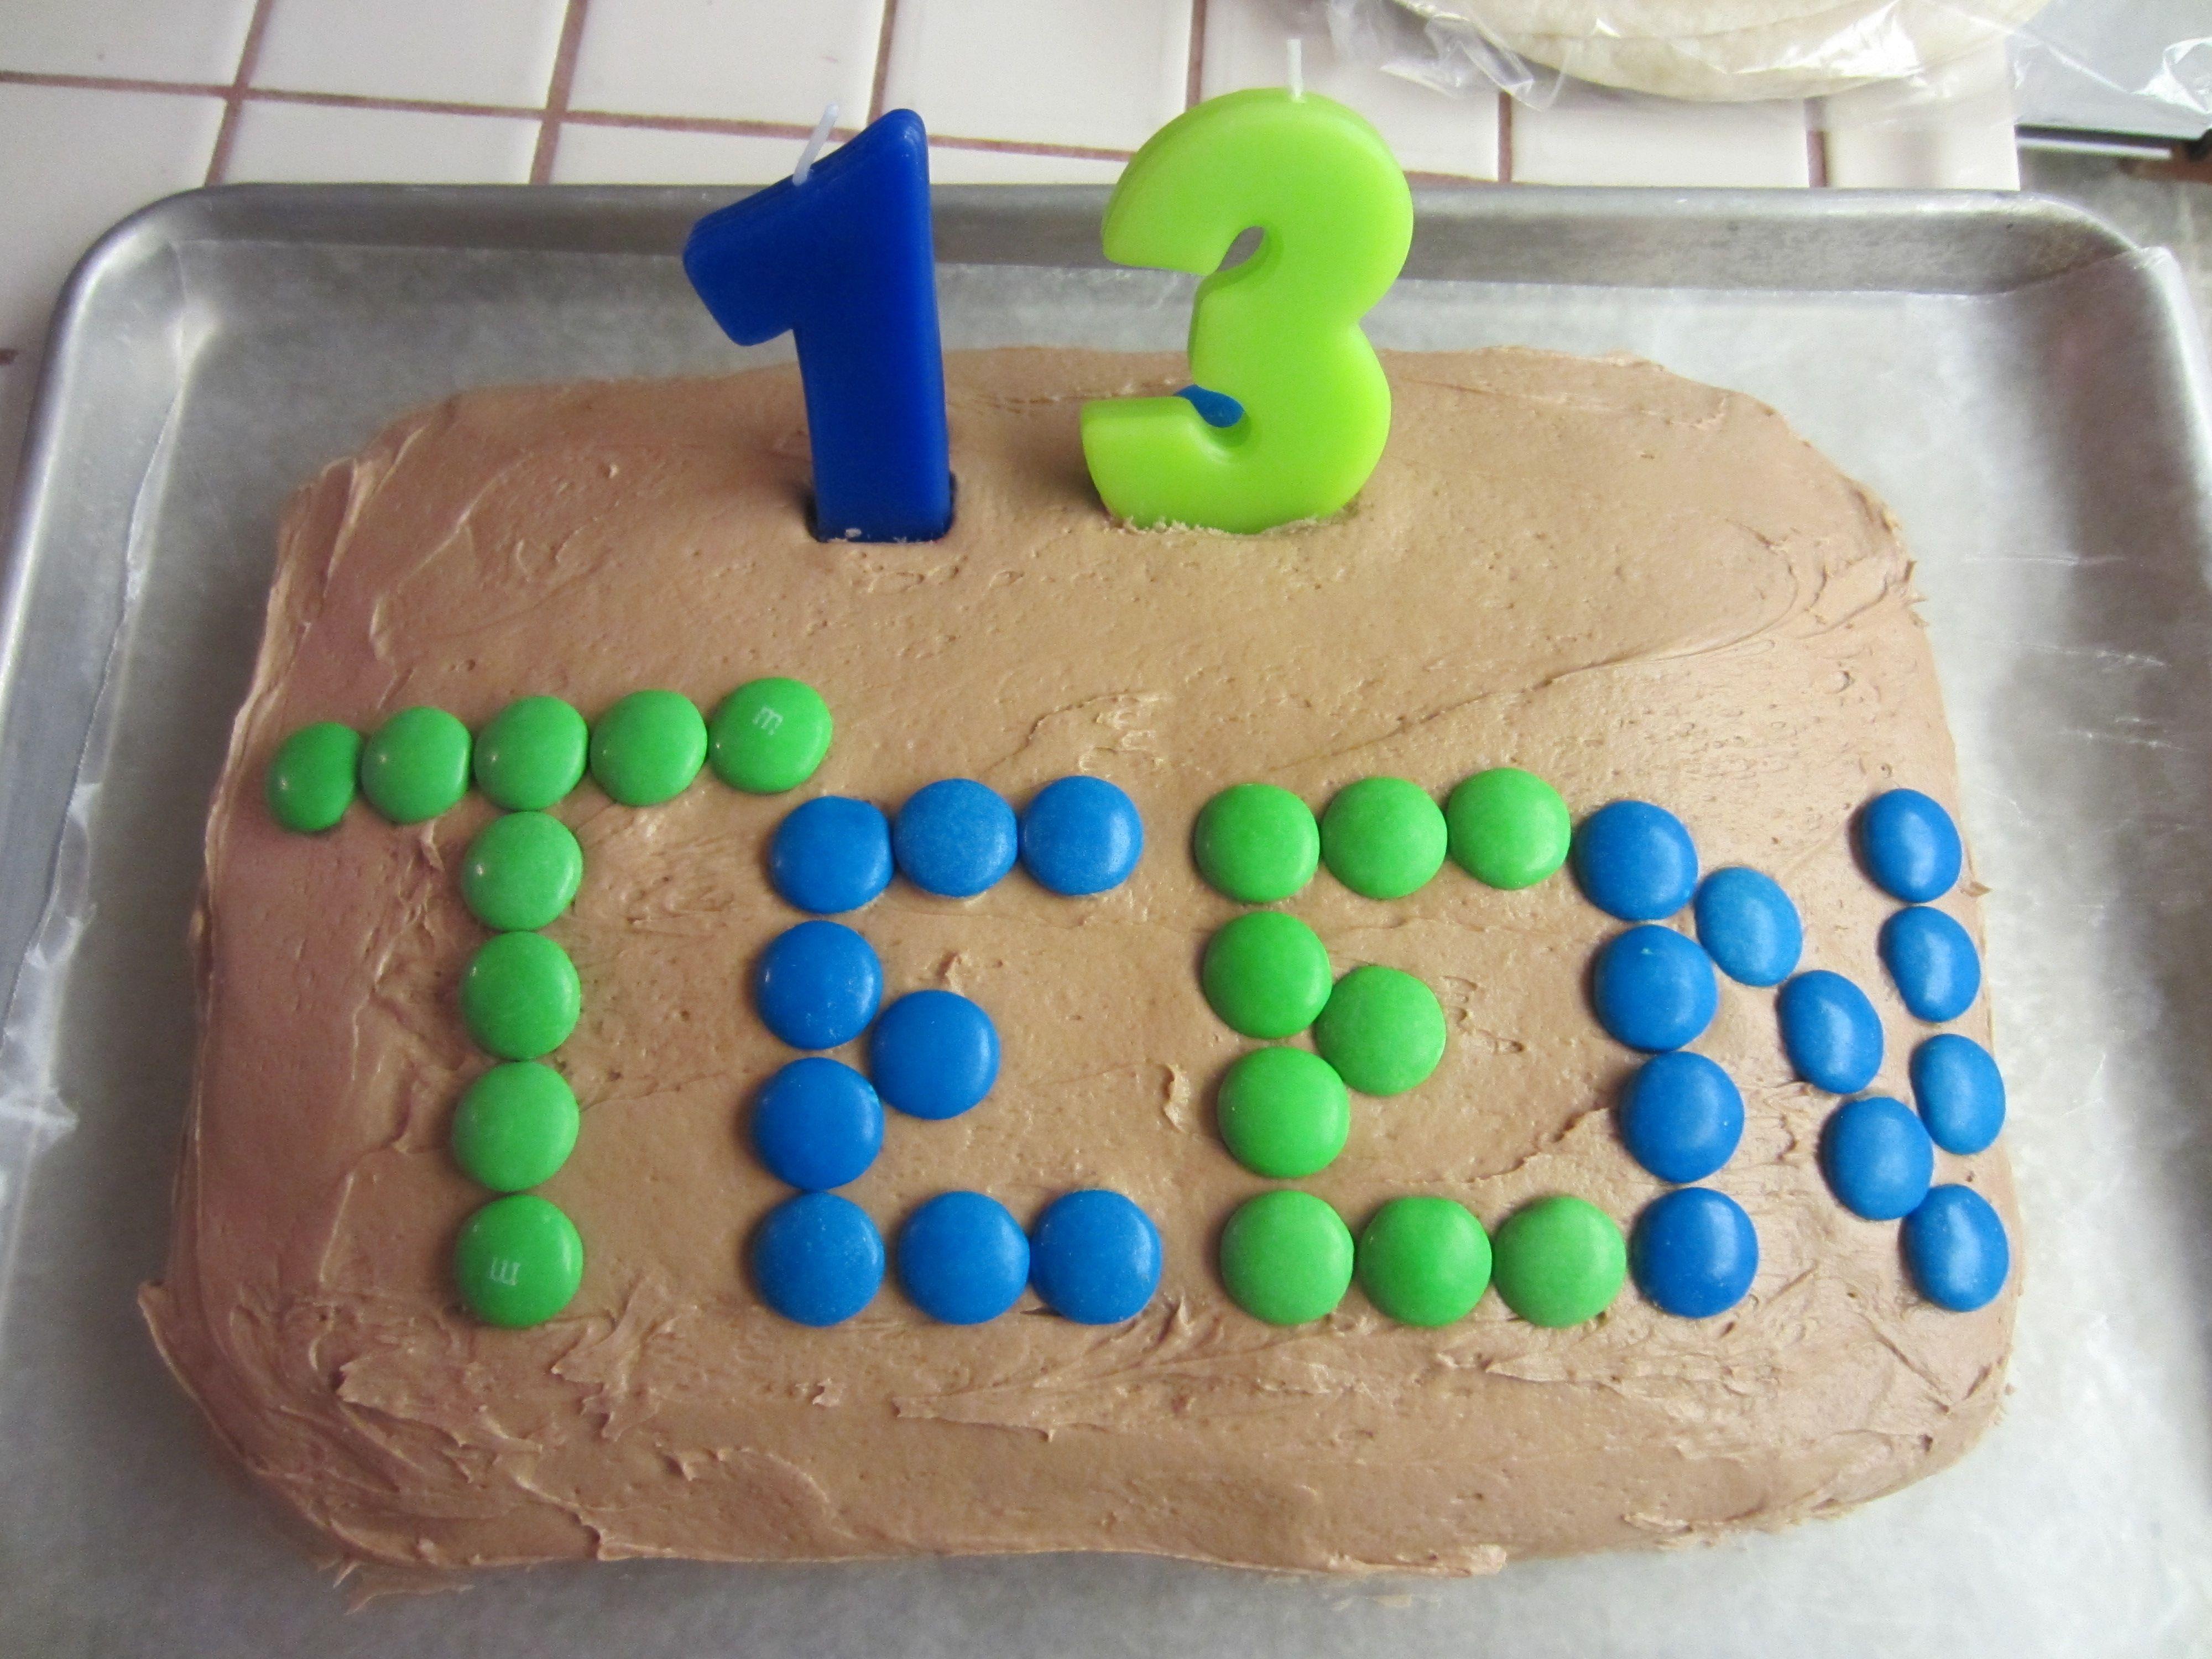 Simple Cake For A No Fuss 13 Yr Old Boy 13 Birthday Cake Boy Birthday Cake Homemade Cakes